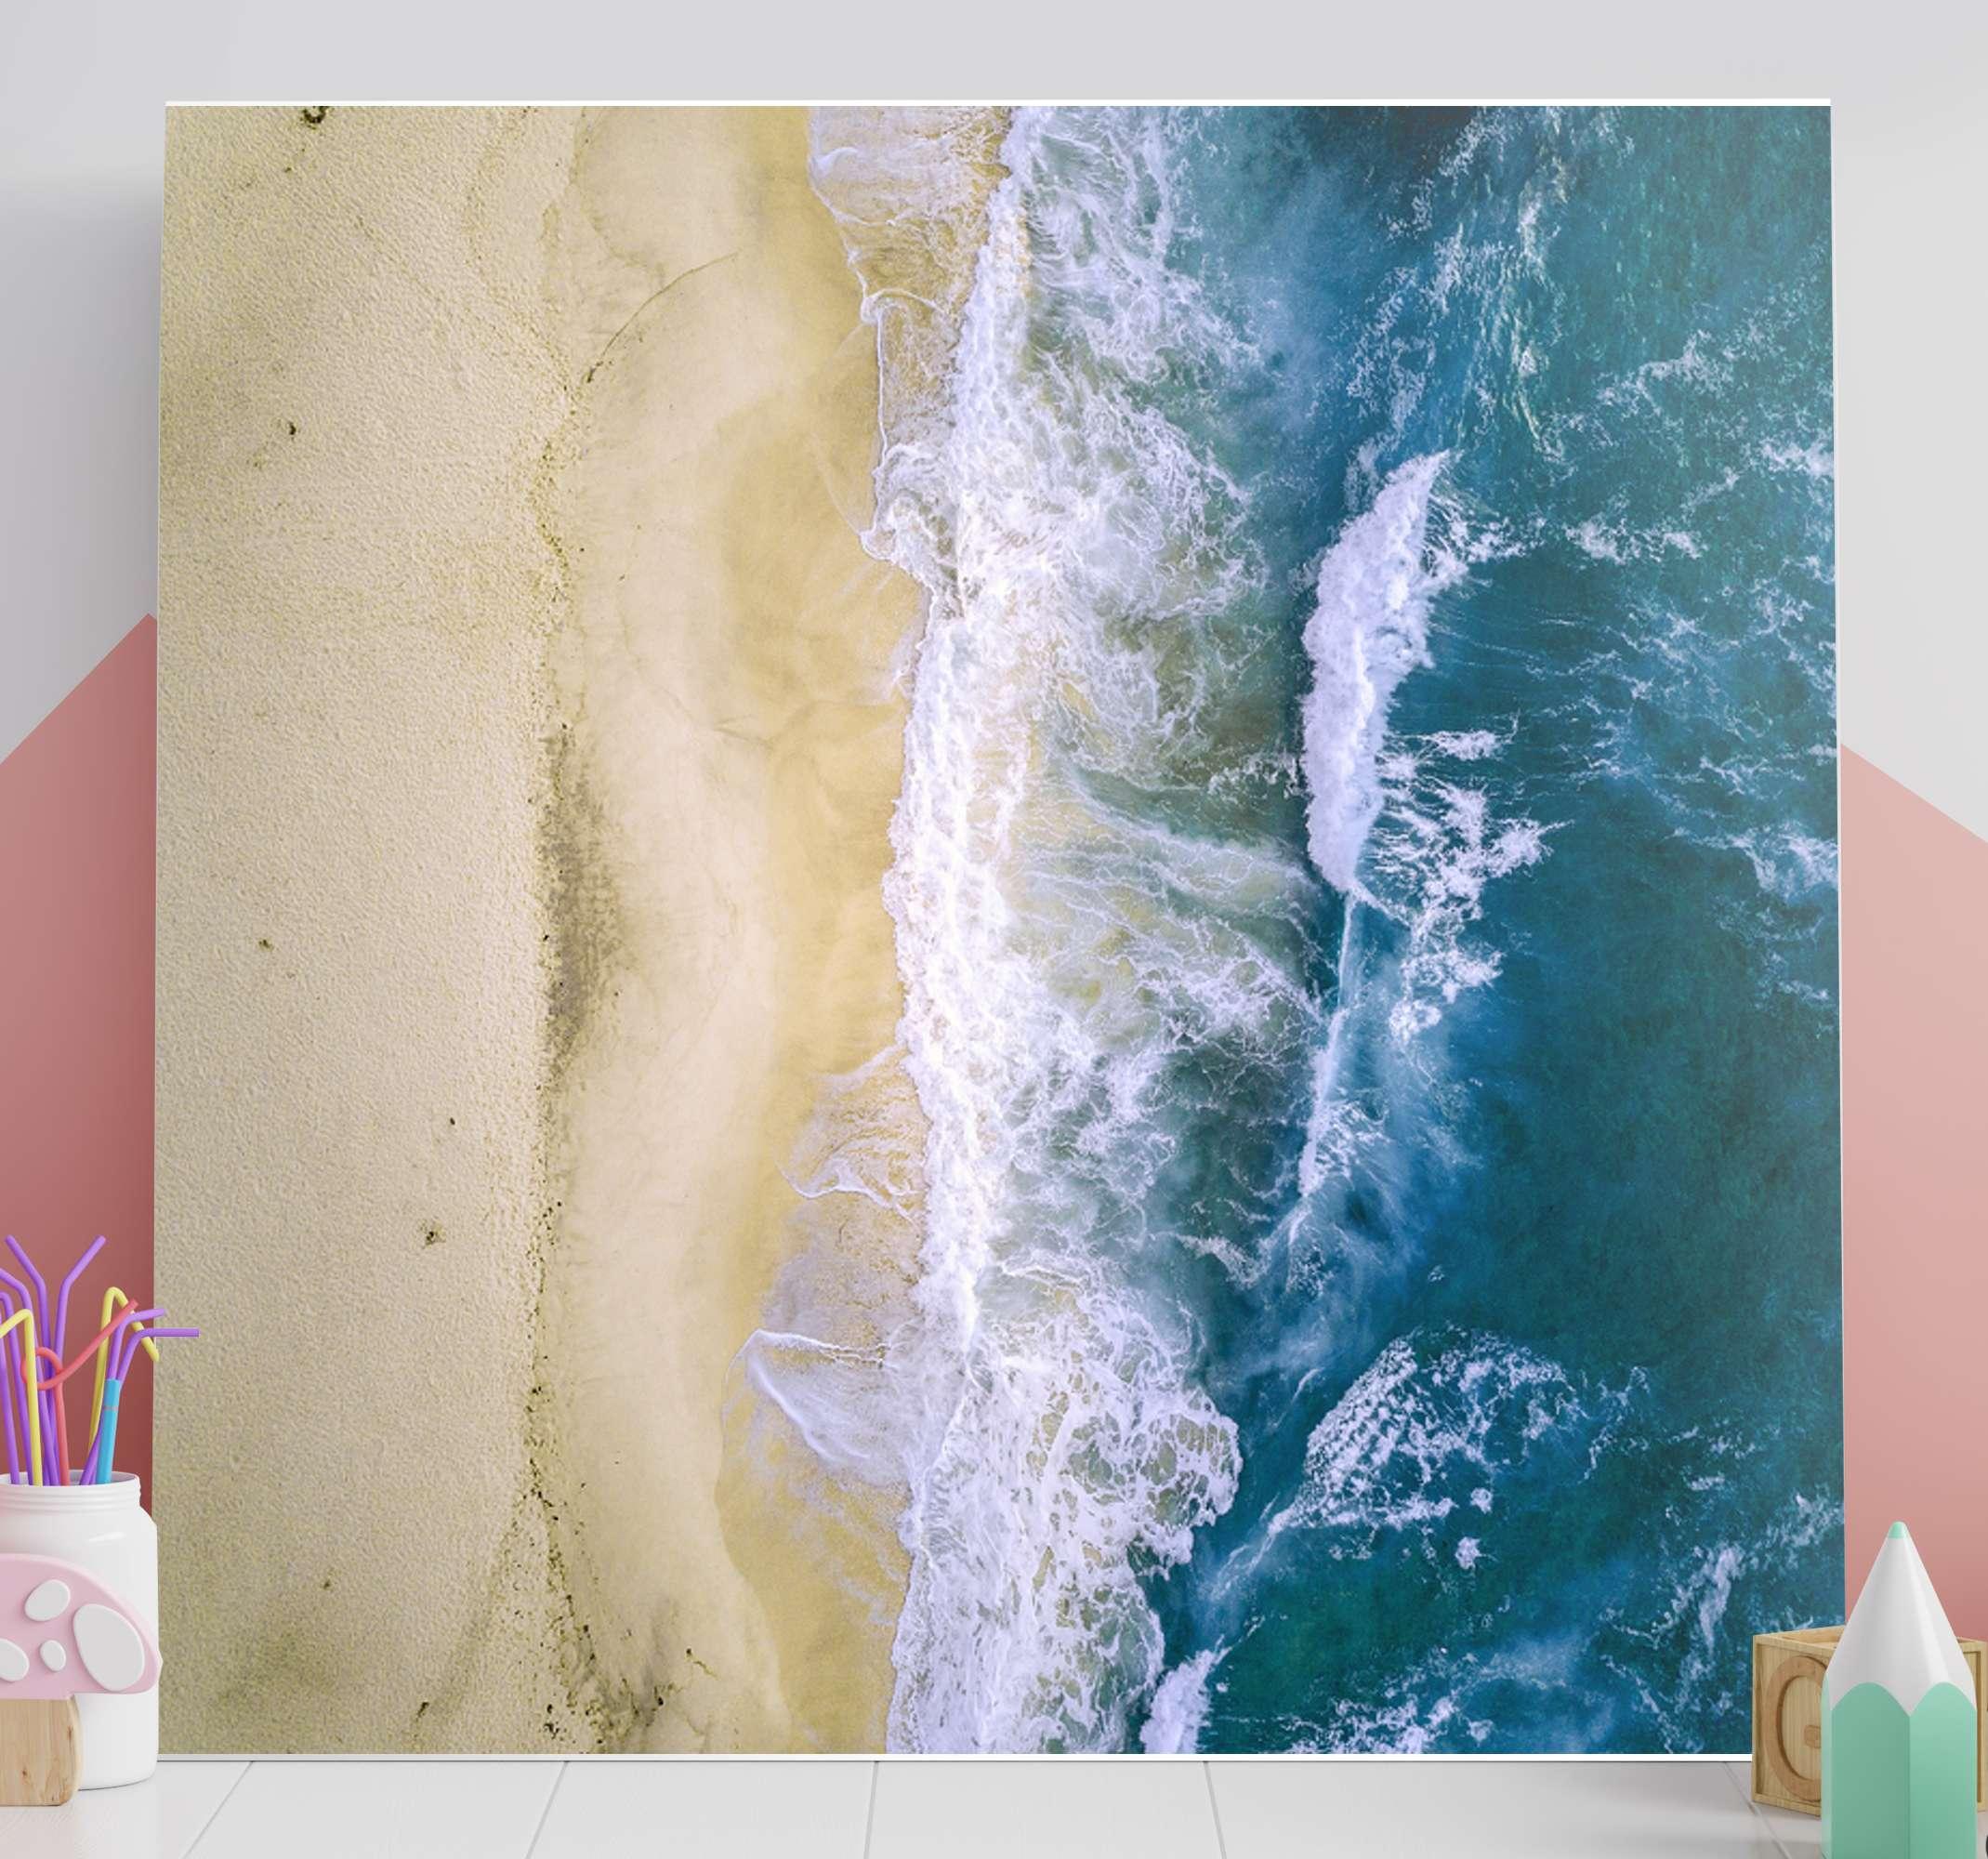 TenStickers. 海沙蓝色景观墙艺术. 您所有的客人都会感到惊讶,您将能够自豪地炫耀您的新装饰,每个人都会羡慕您。